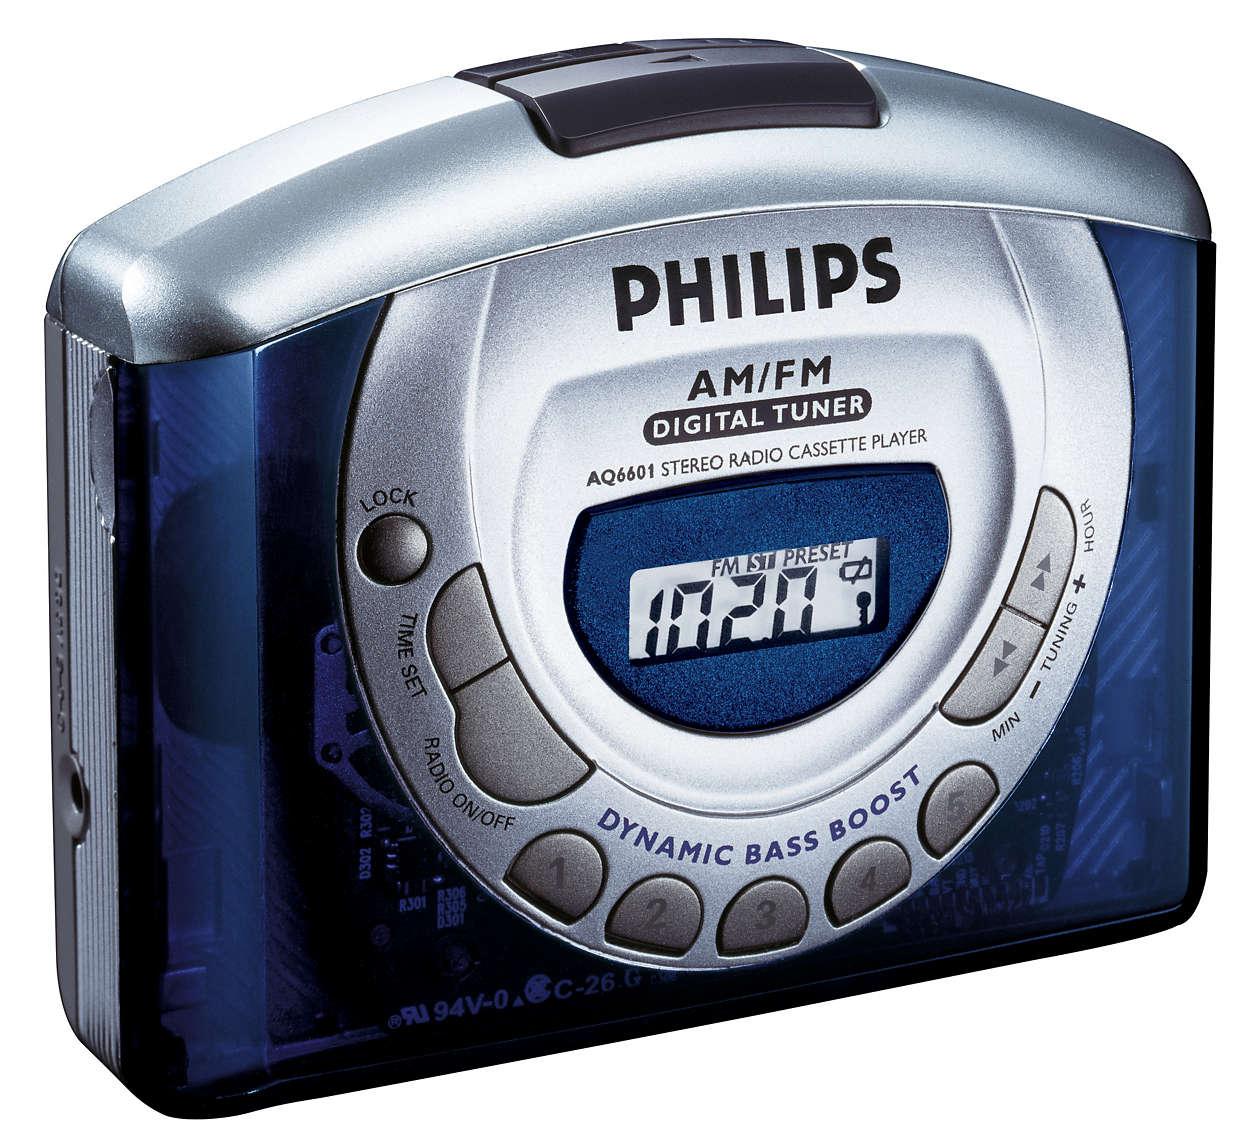 Digital stereo radio